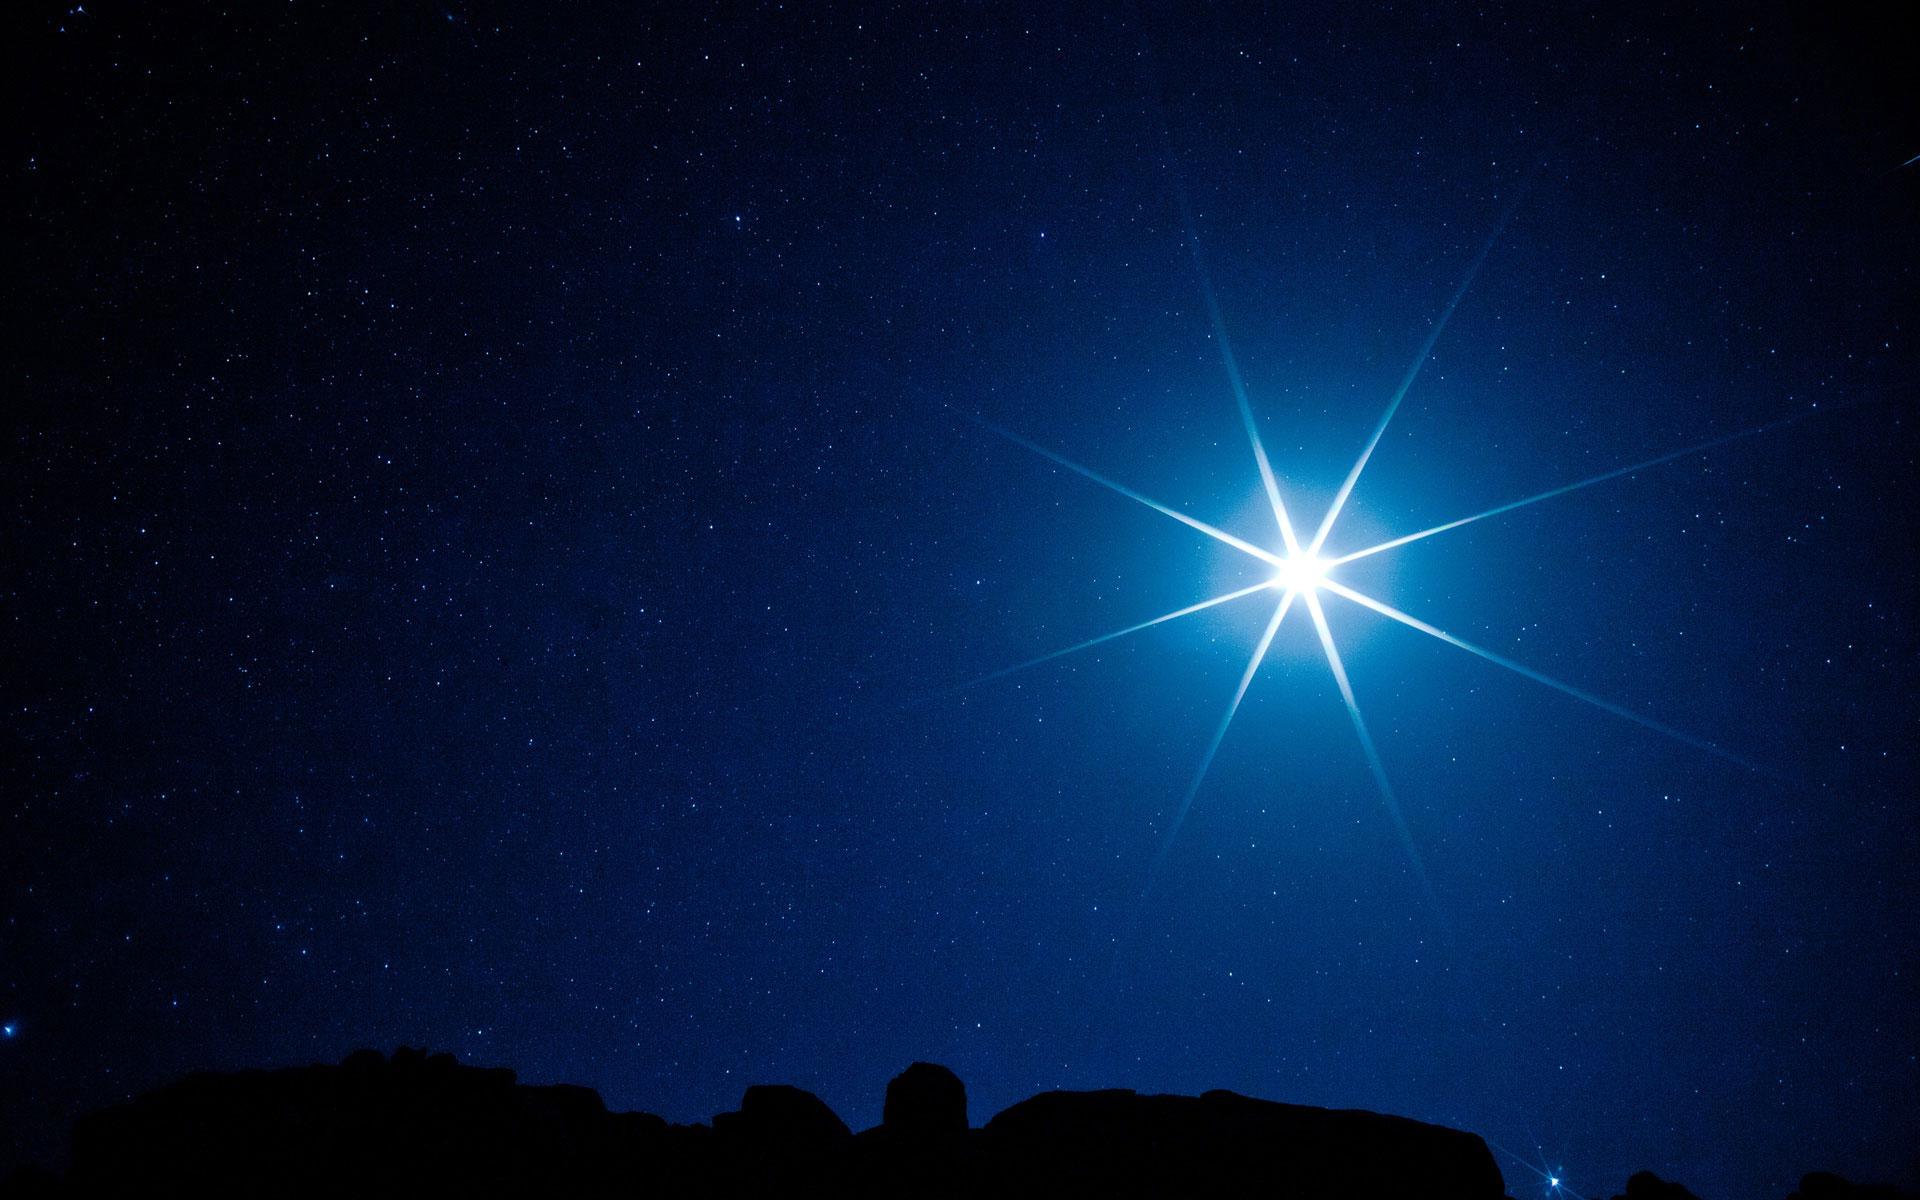 фото звезд в журнале пенхауз